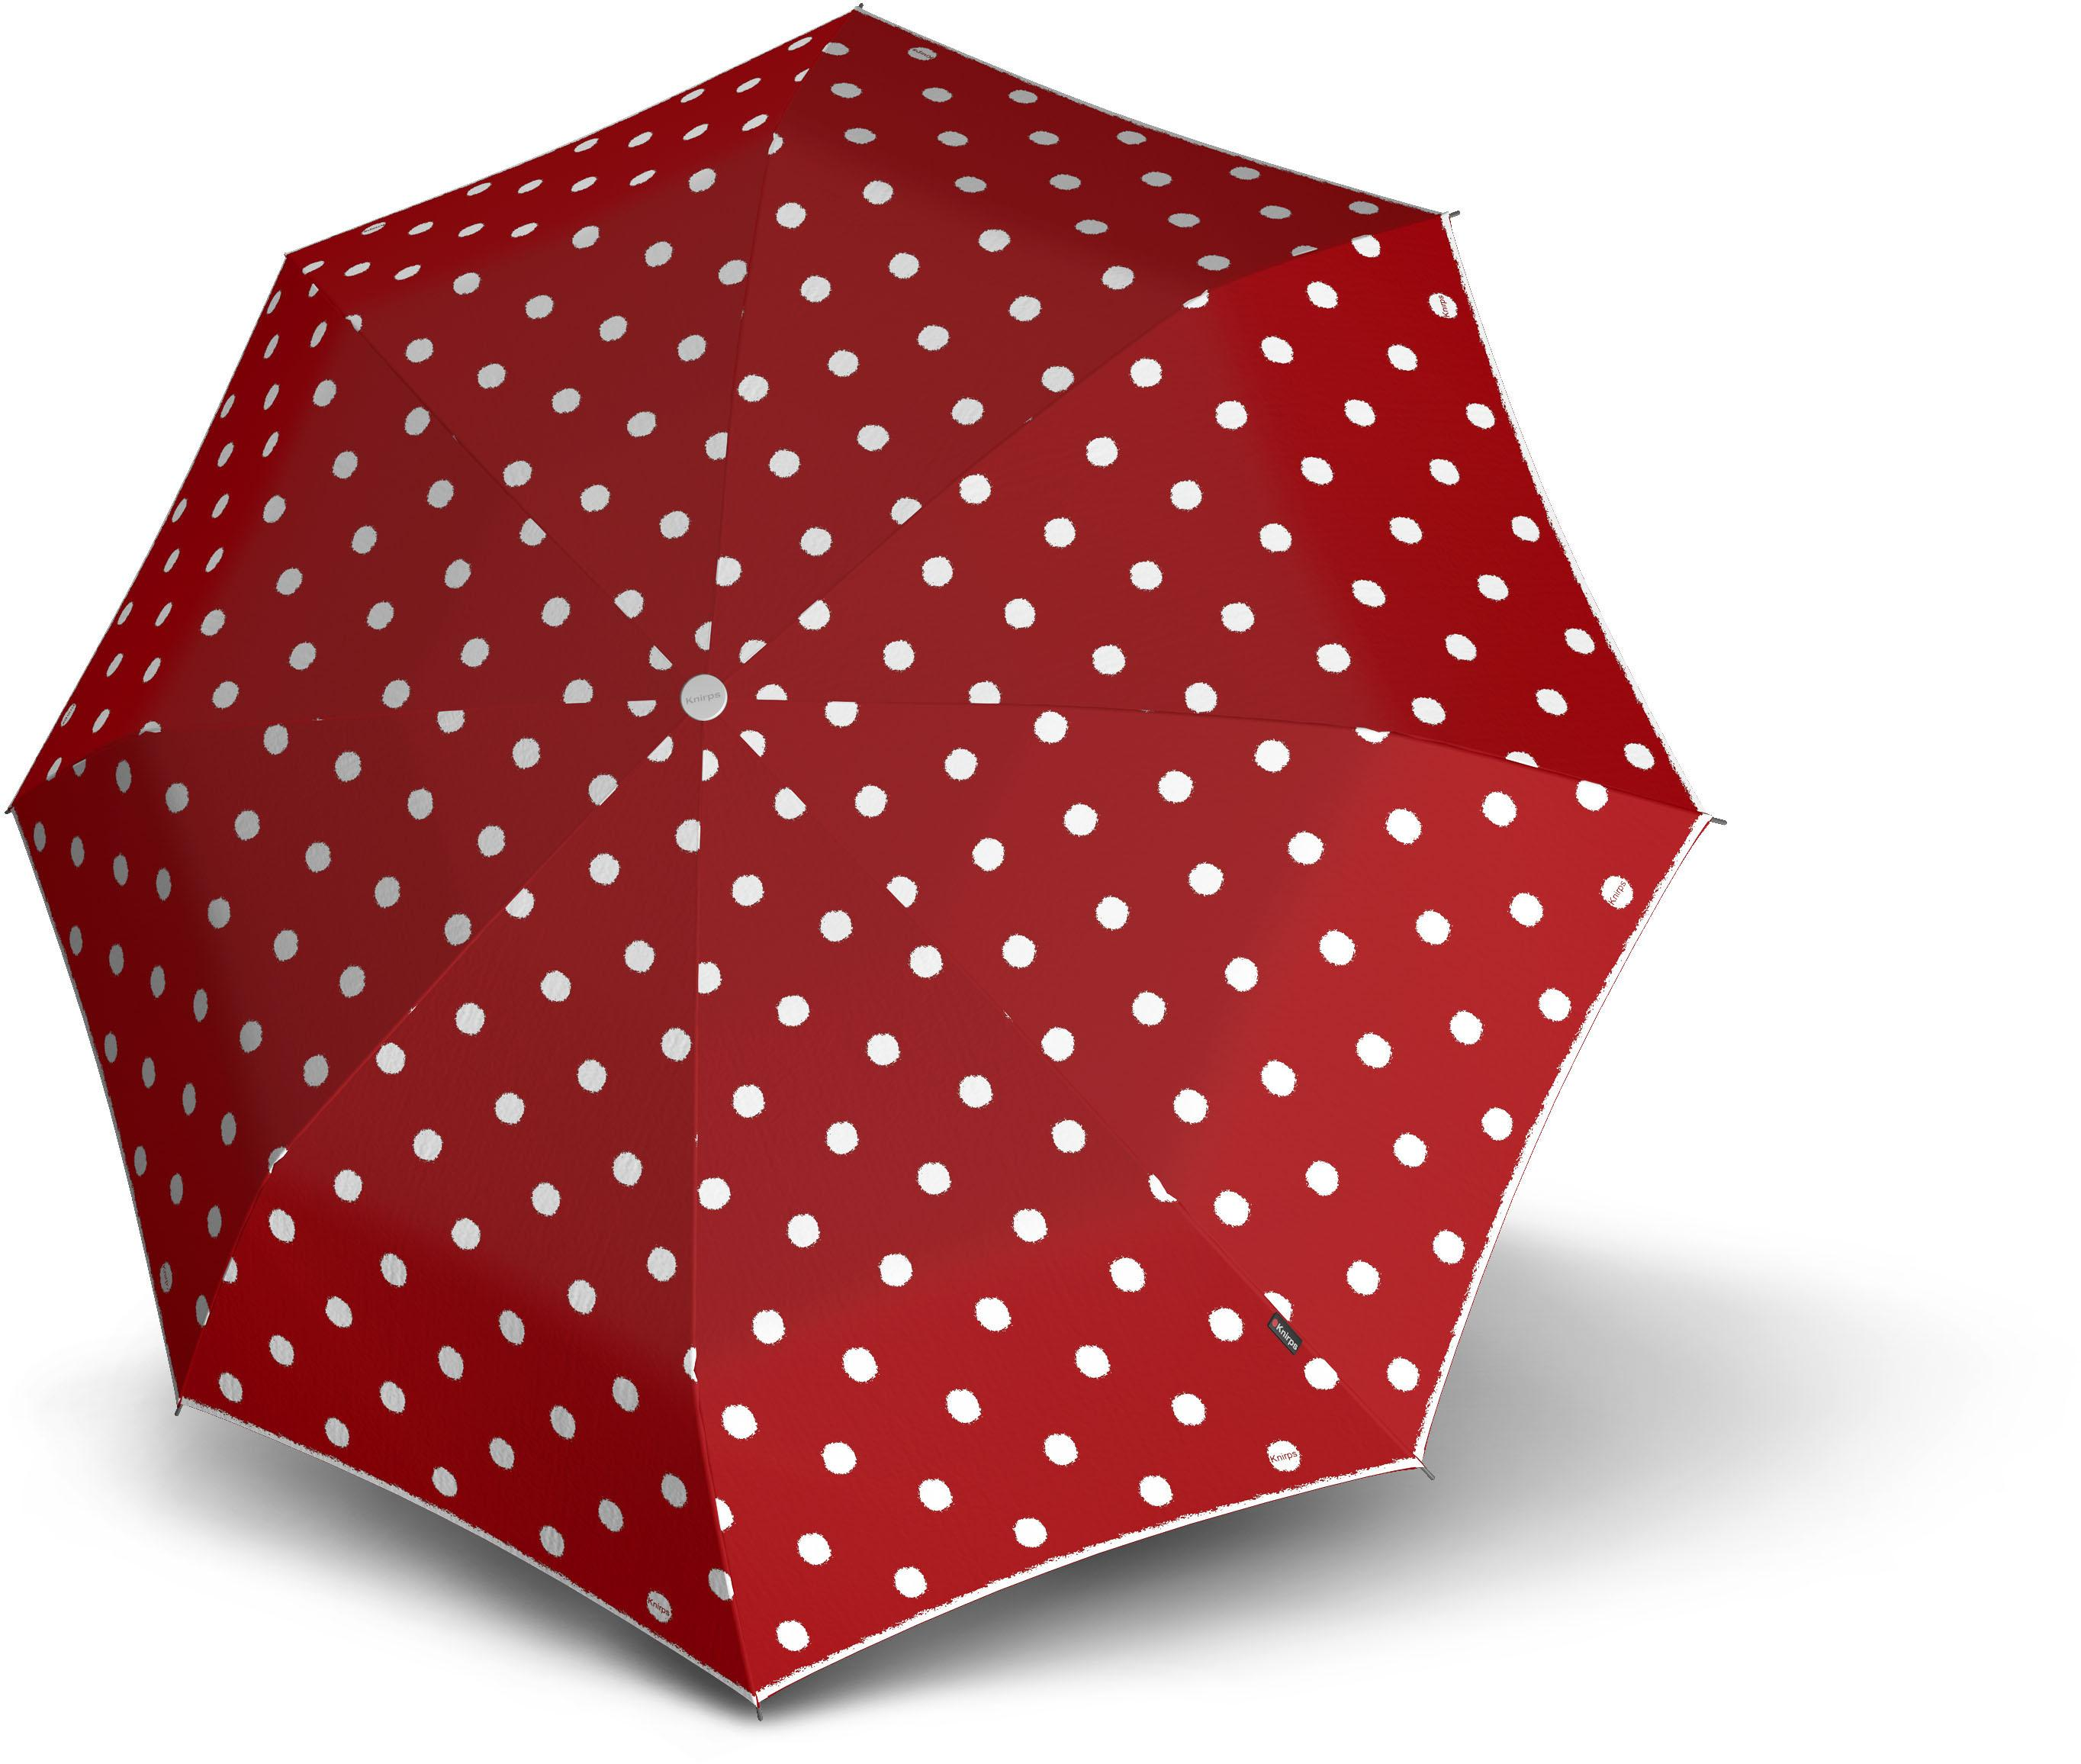 Knirps®, Taschenregenschirm ´´T.010 Small Manual´´ | Accessoires > Regenschirme | Rot | KNIRPS